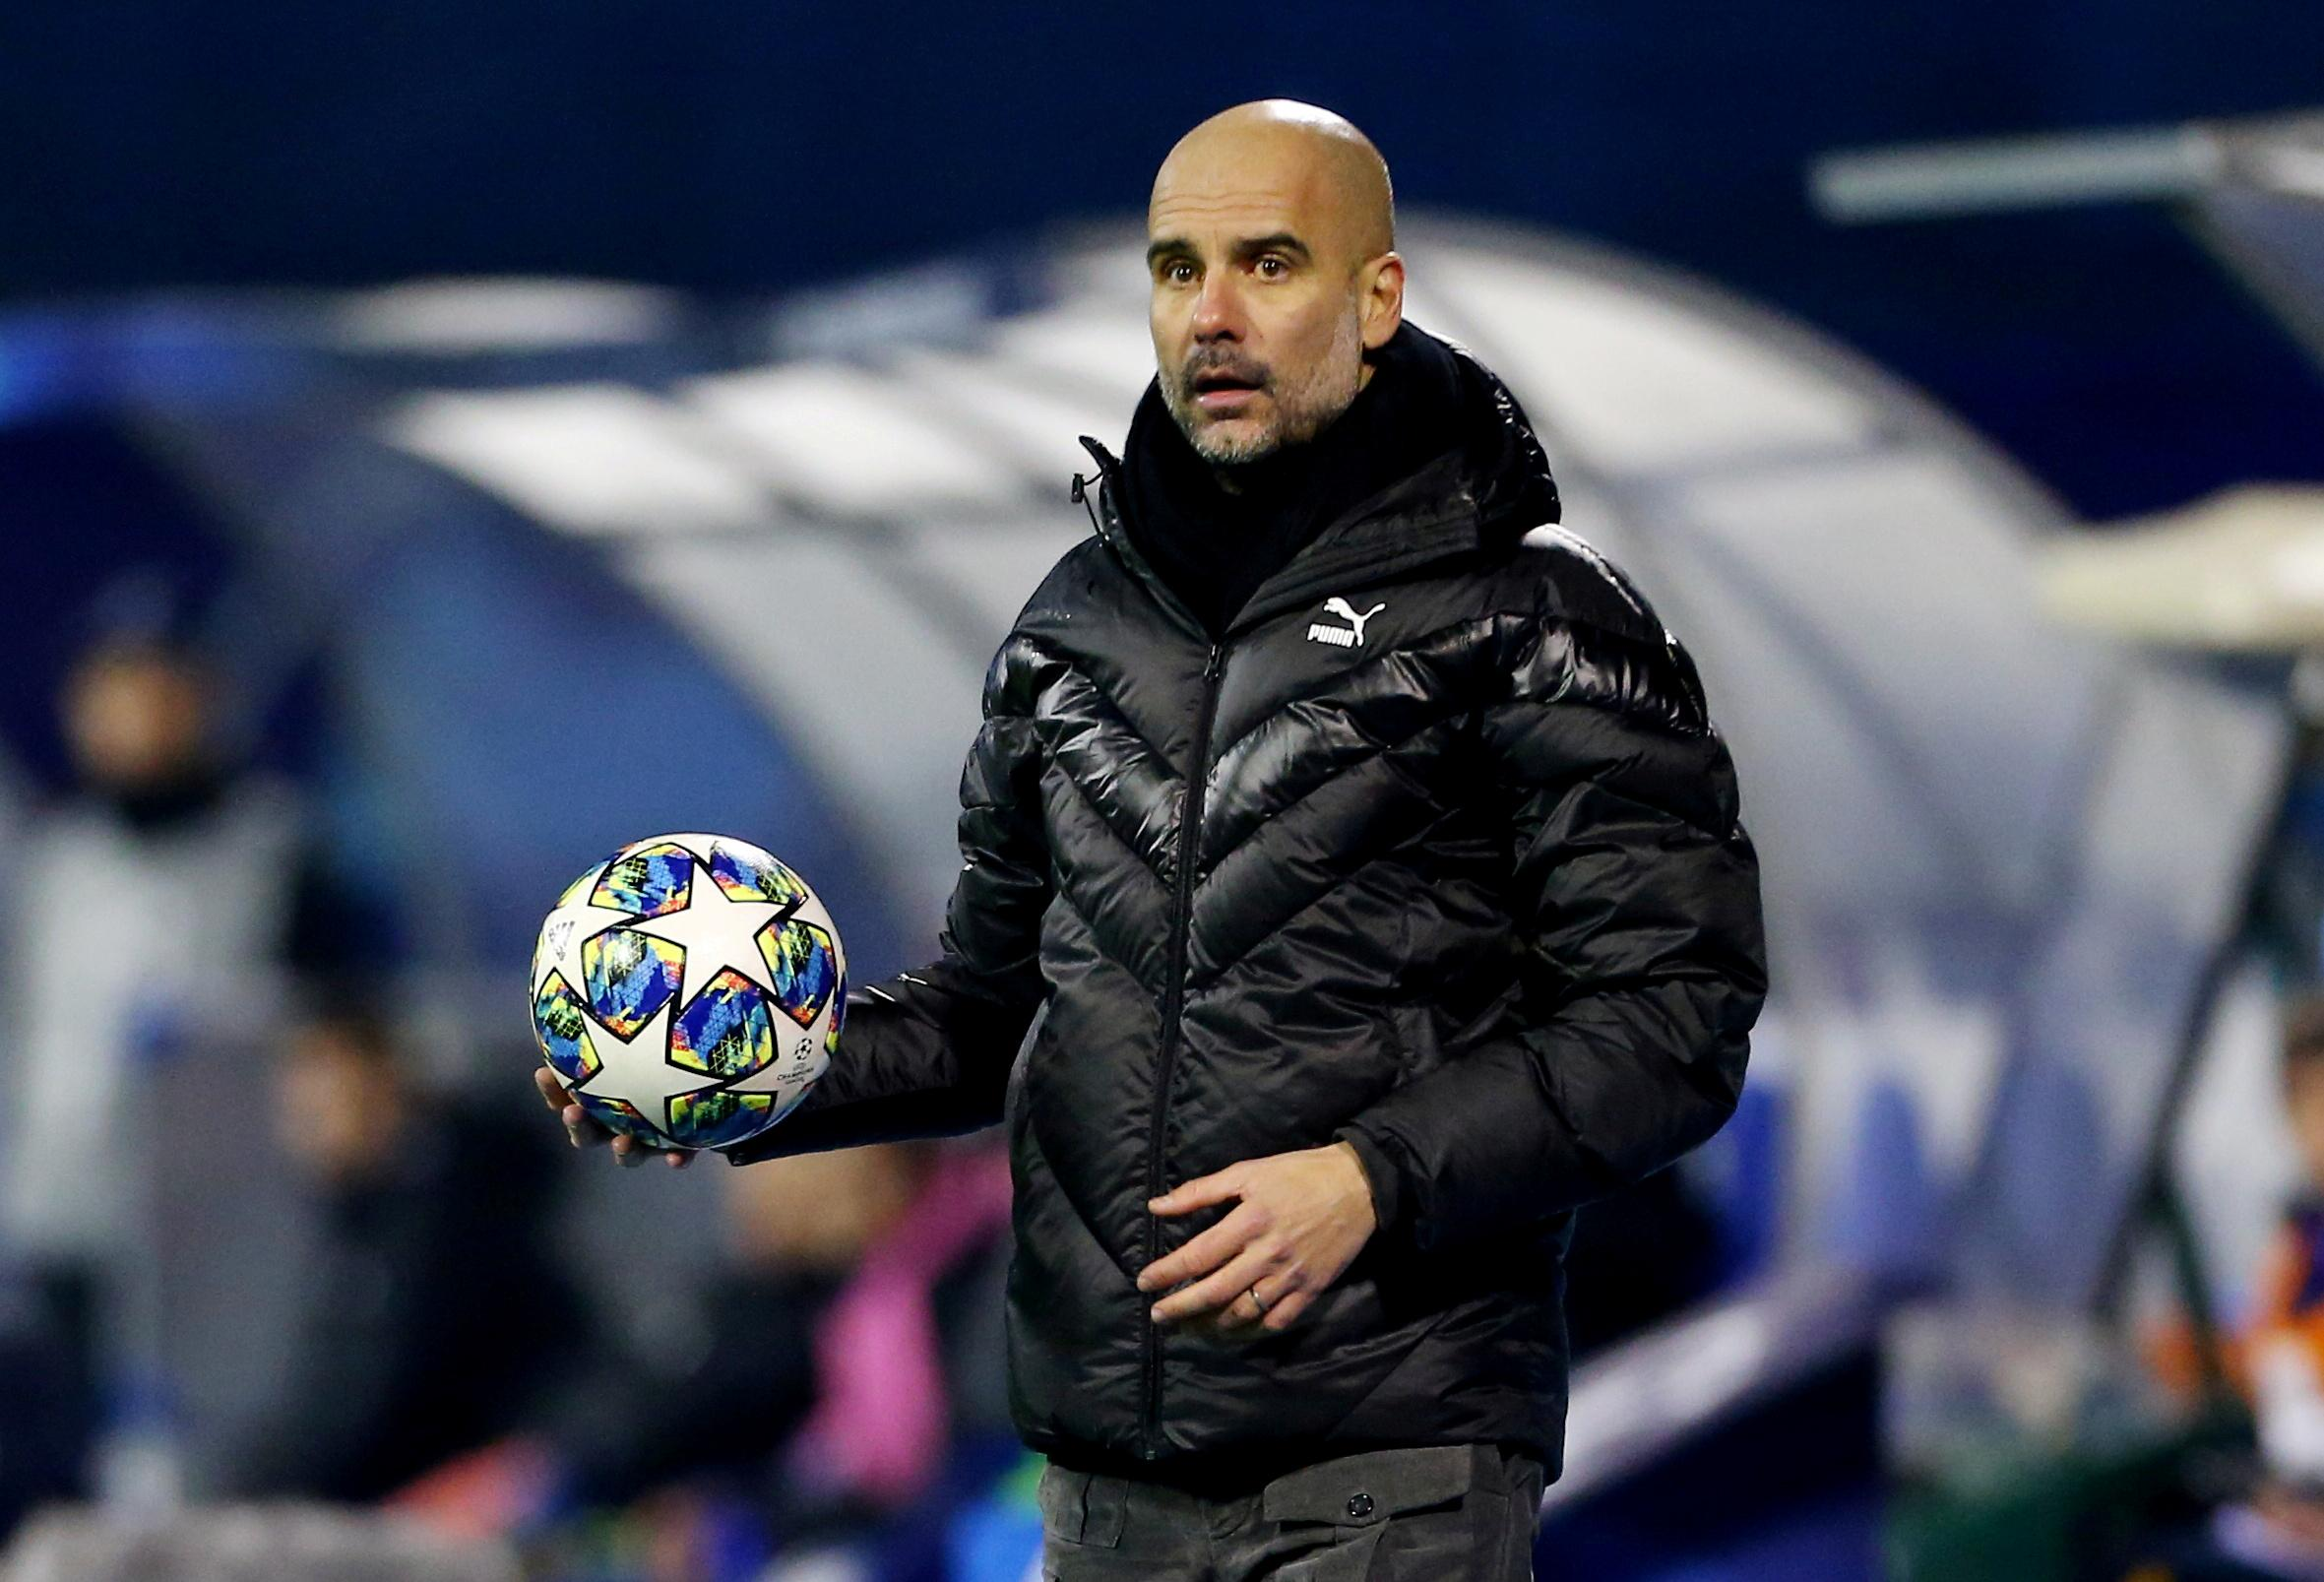 No break clause in City contract, says Guardiola